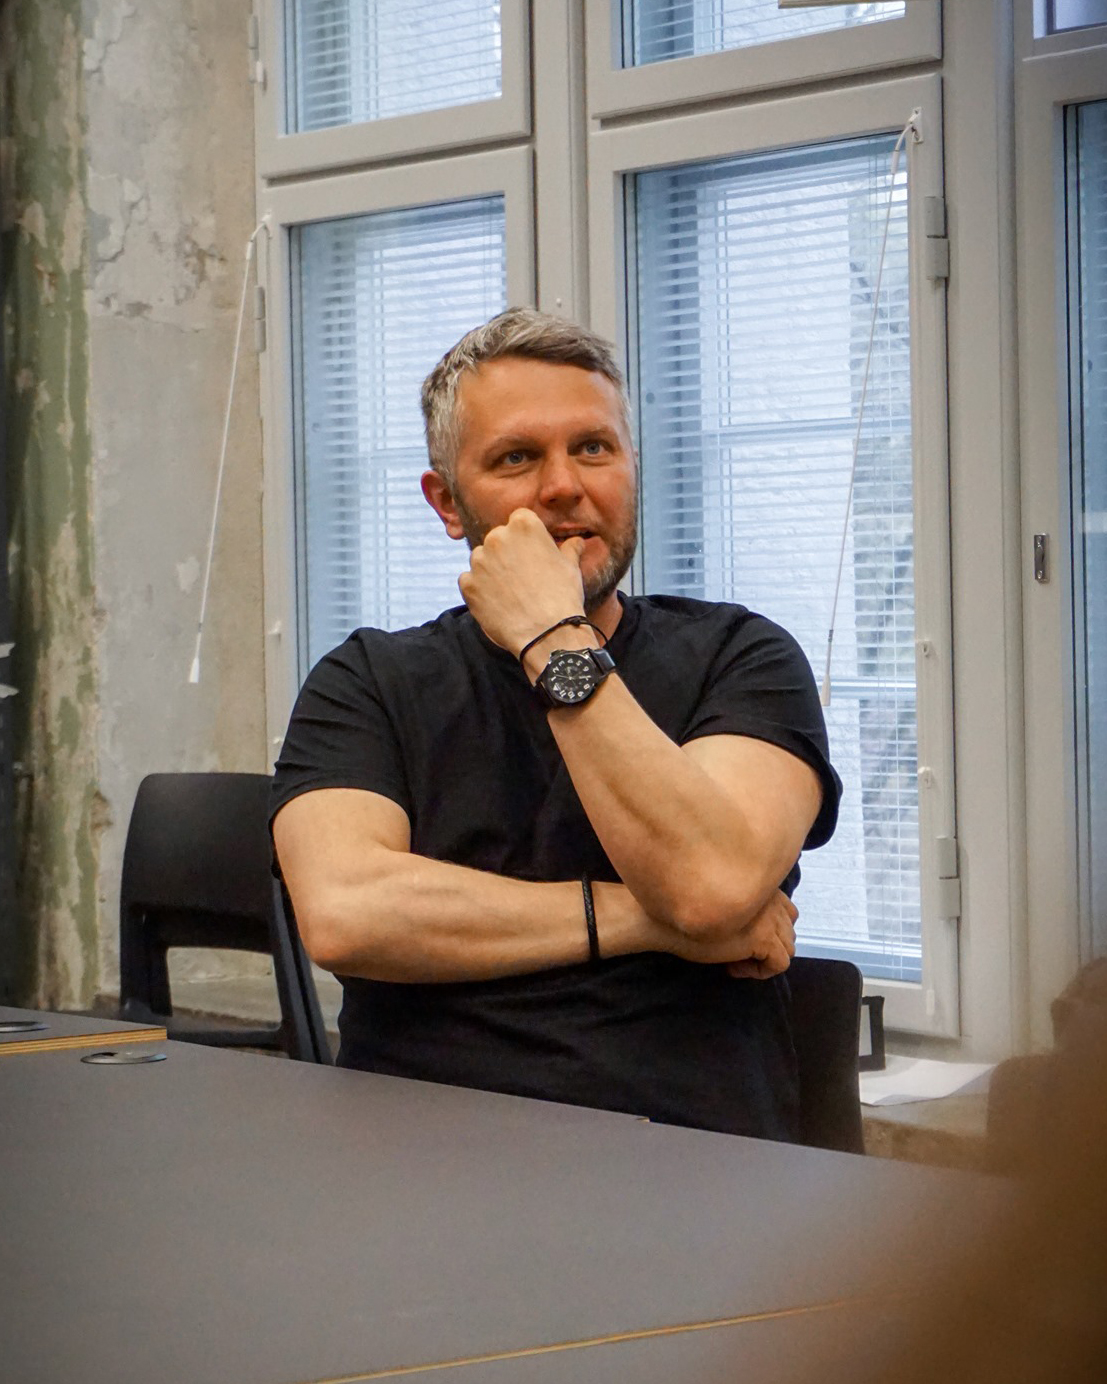 Kristian Lember